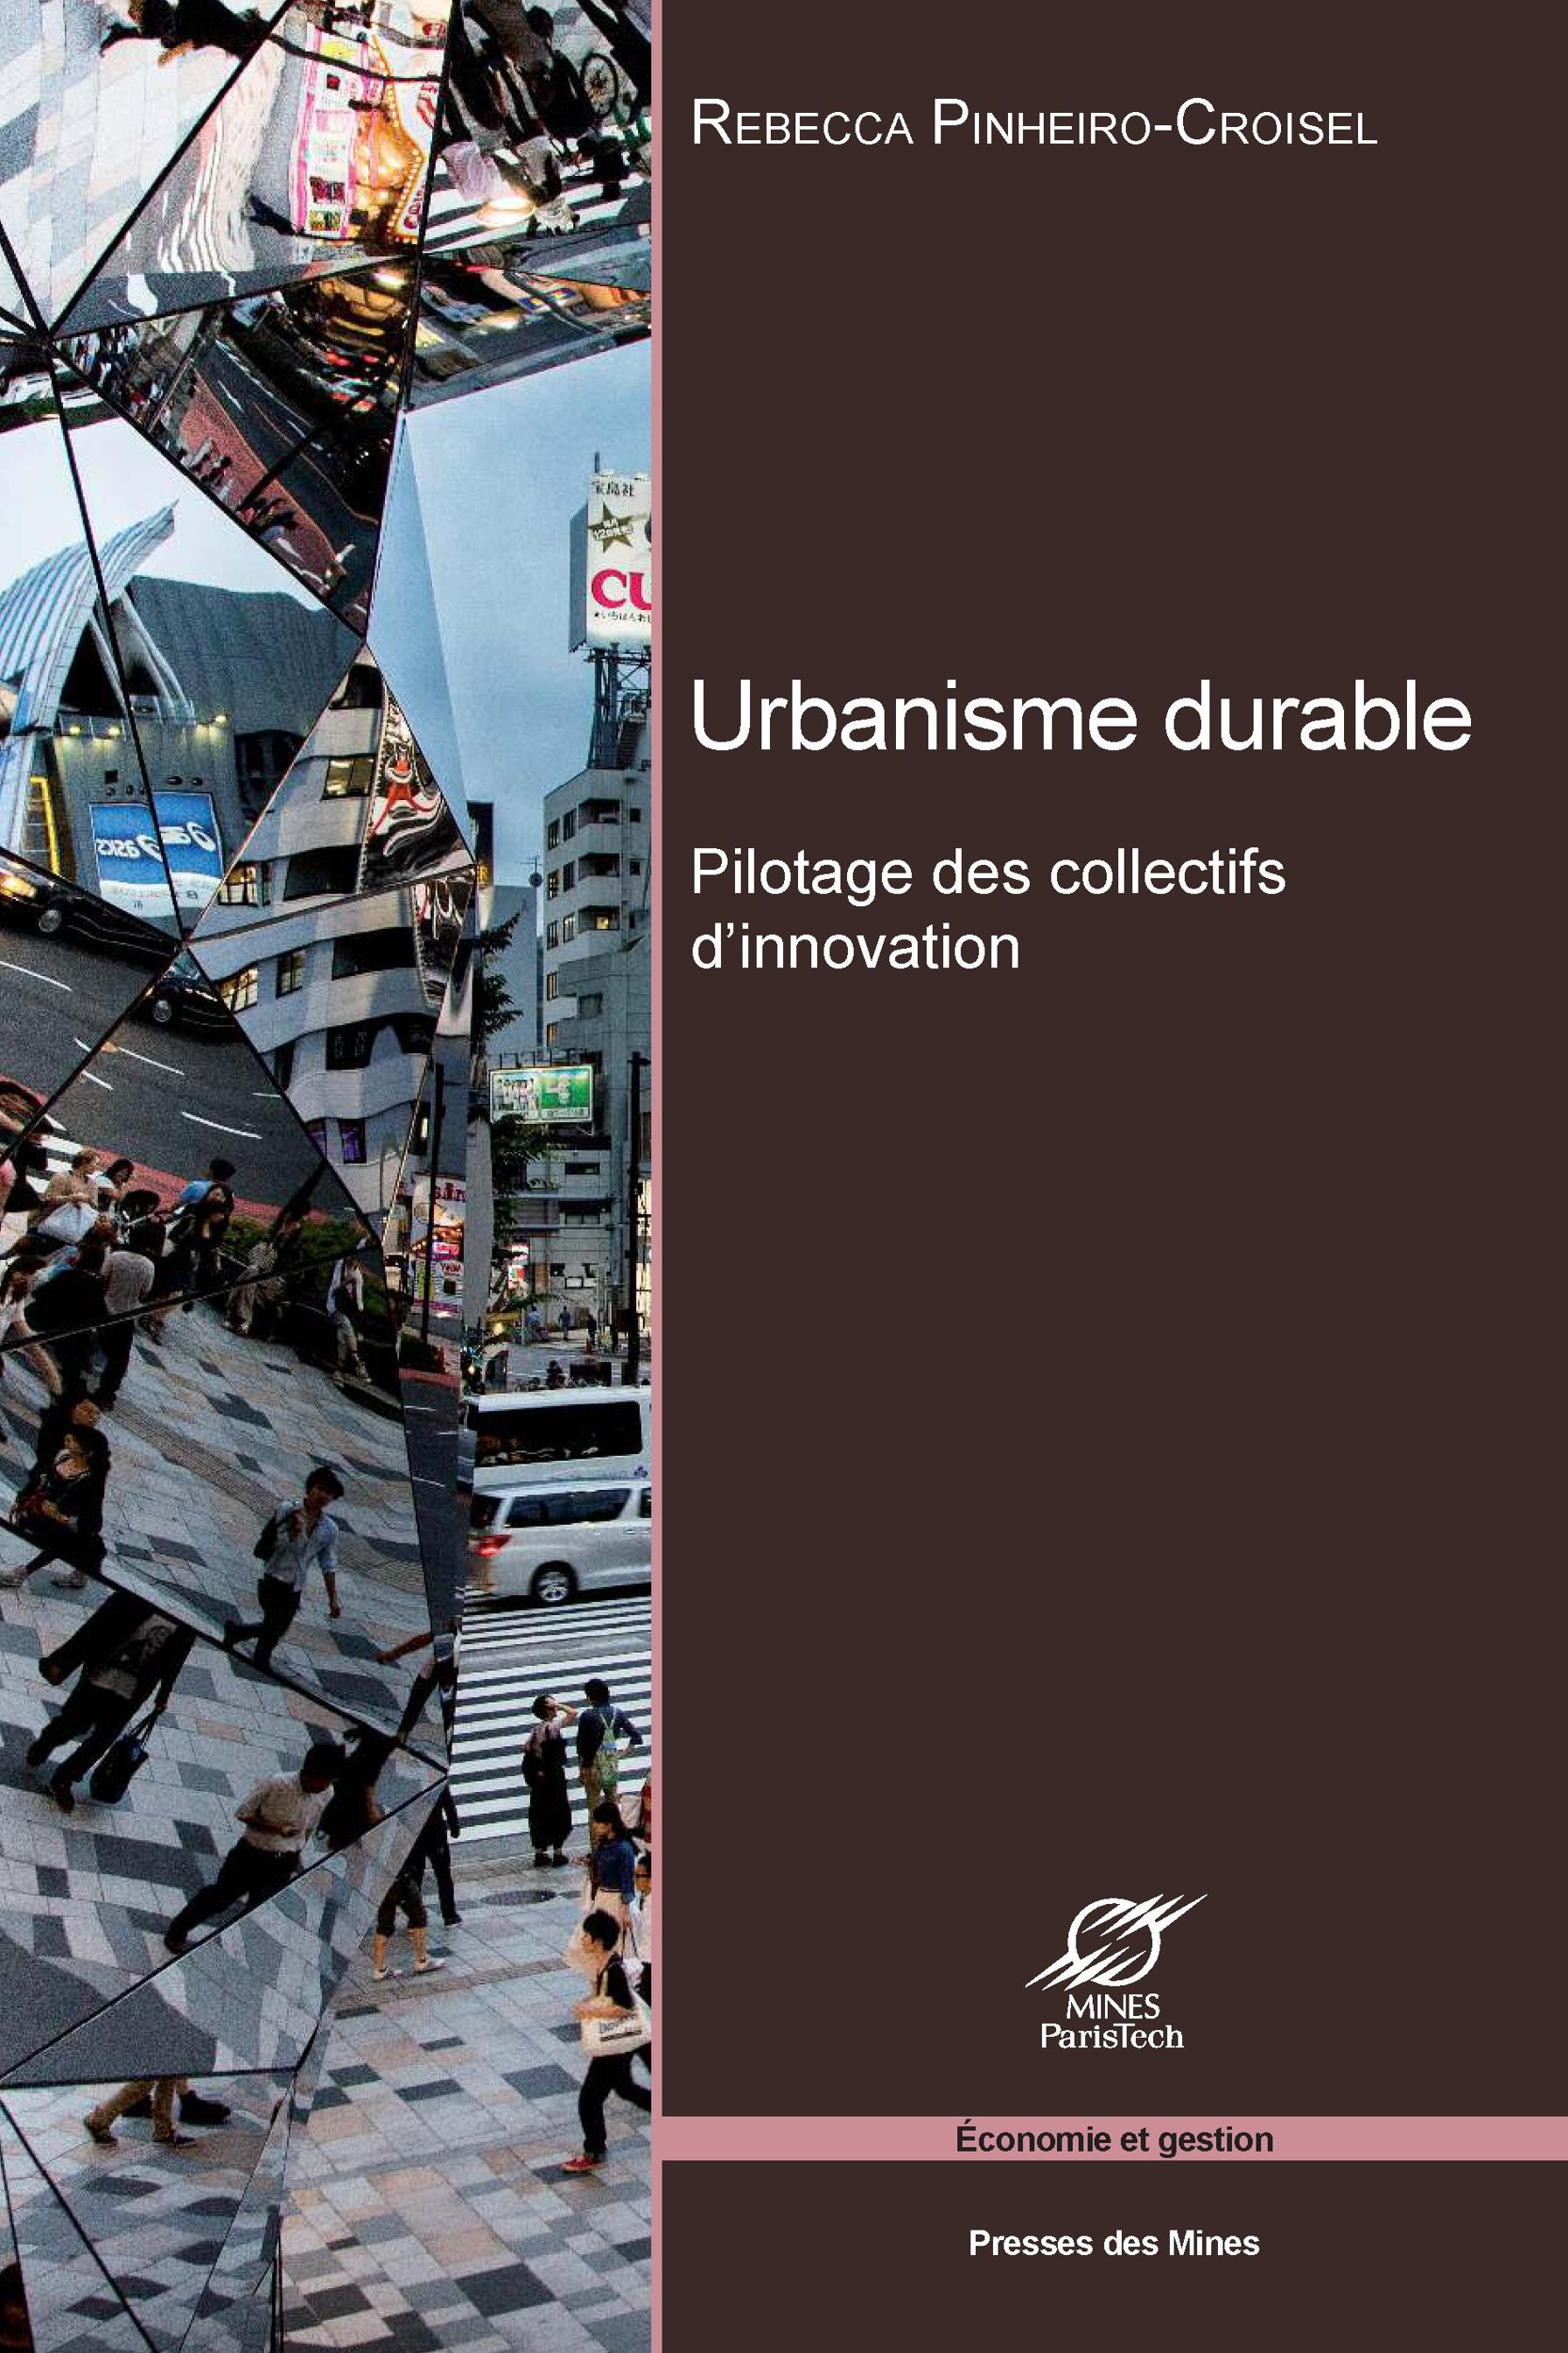 Rebecca Pinheiro-Croisel Urbanisme durable